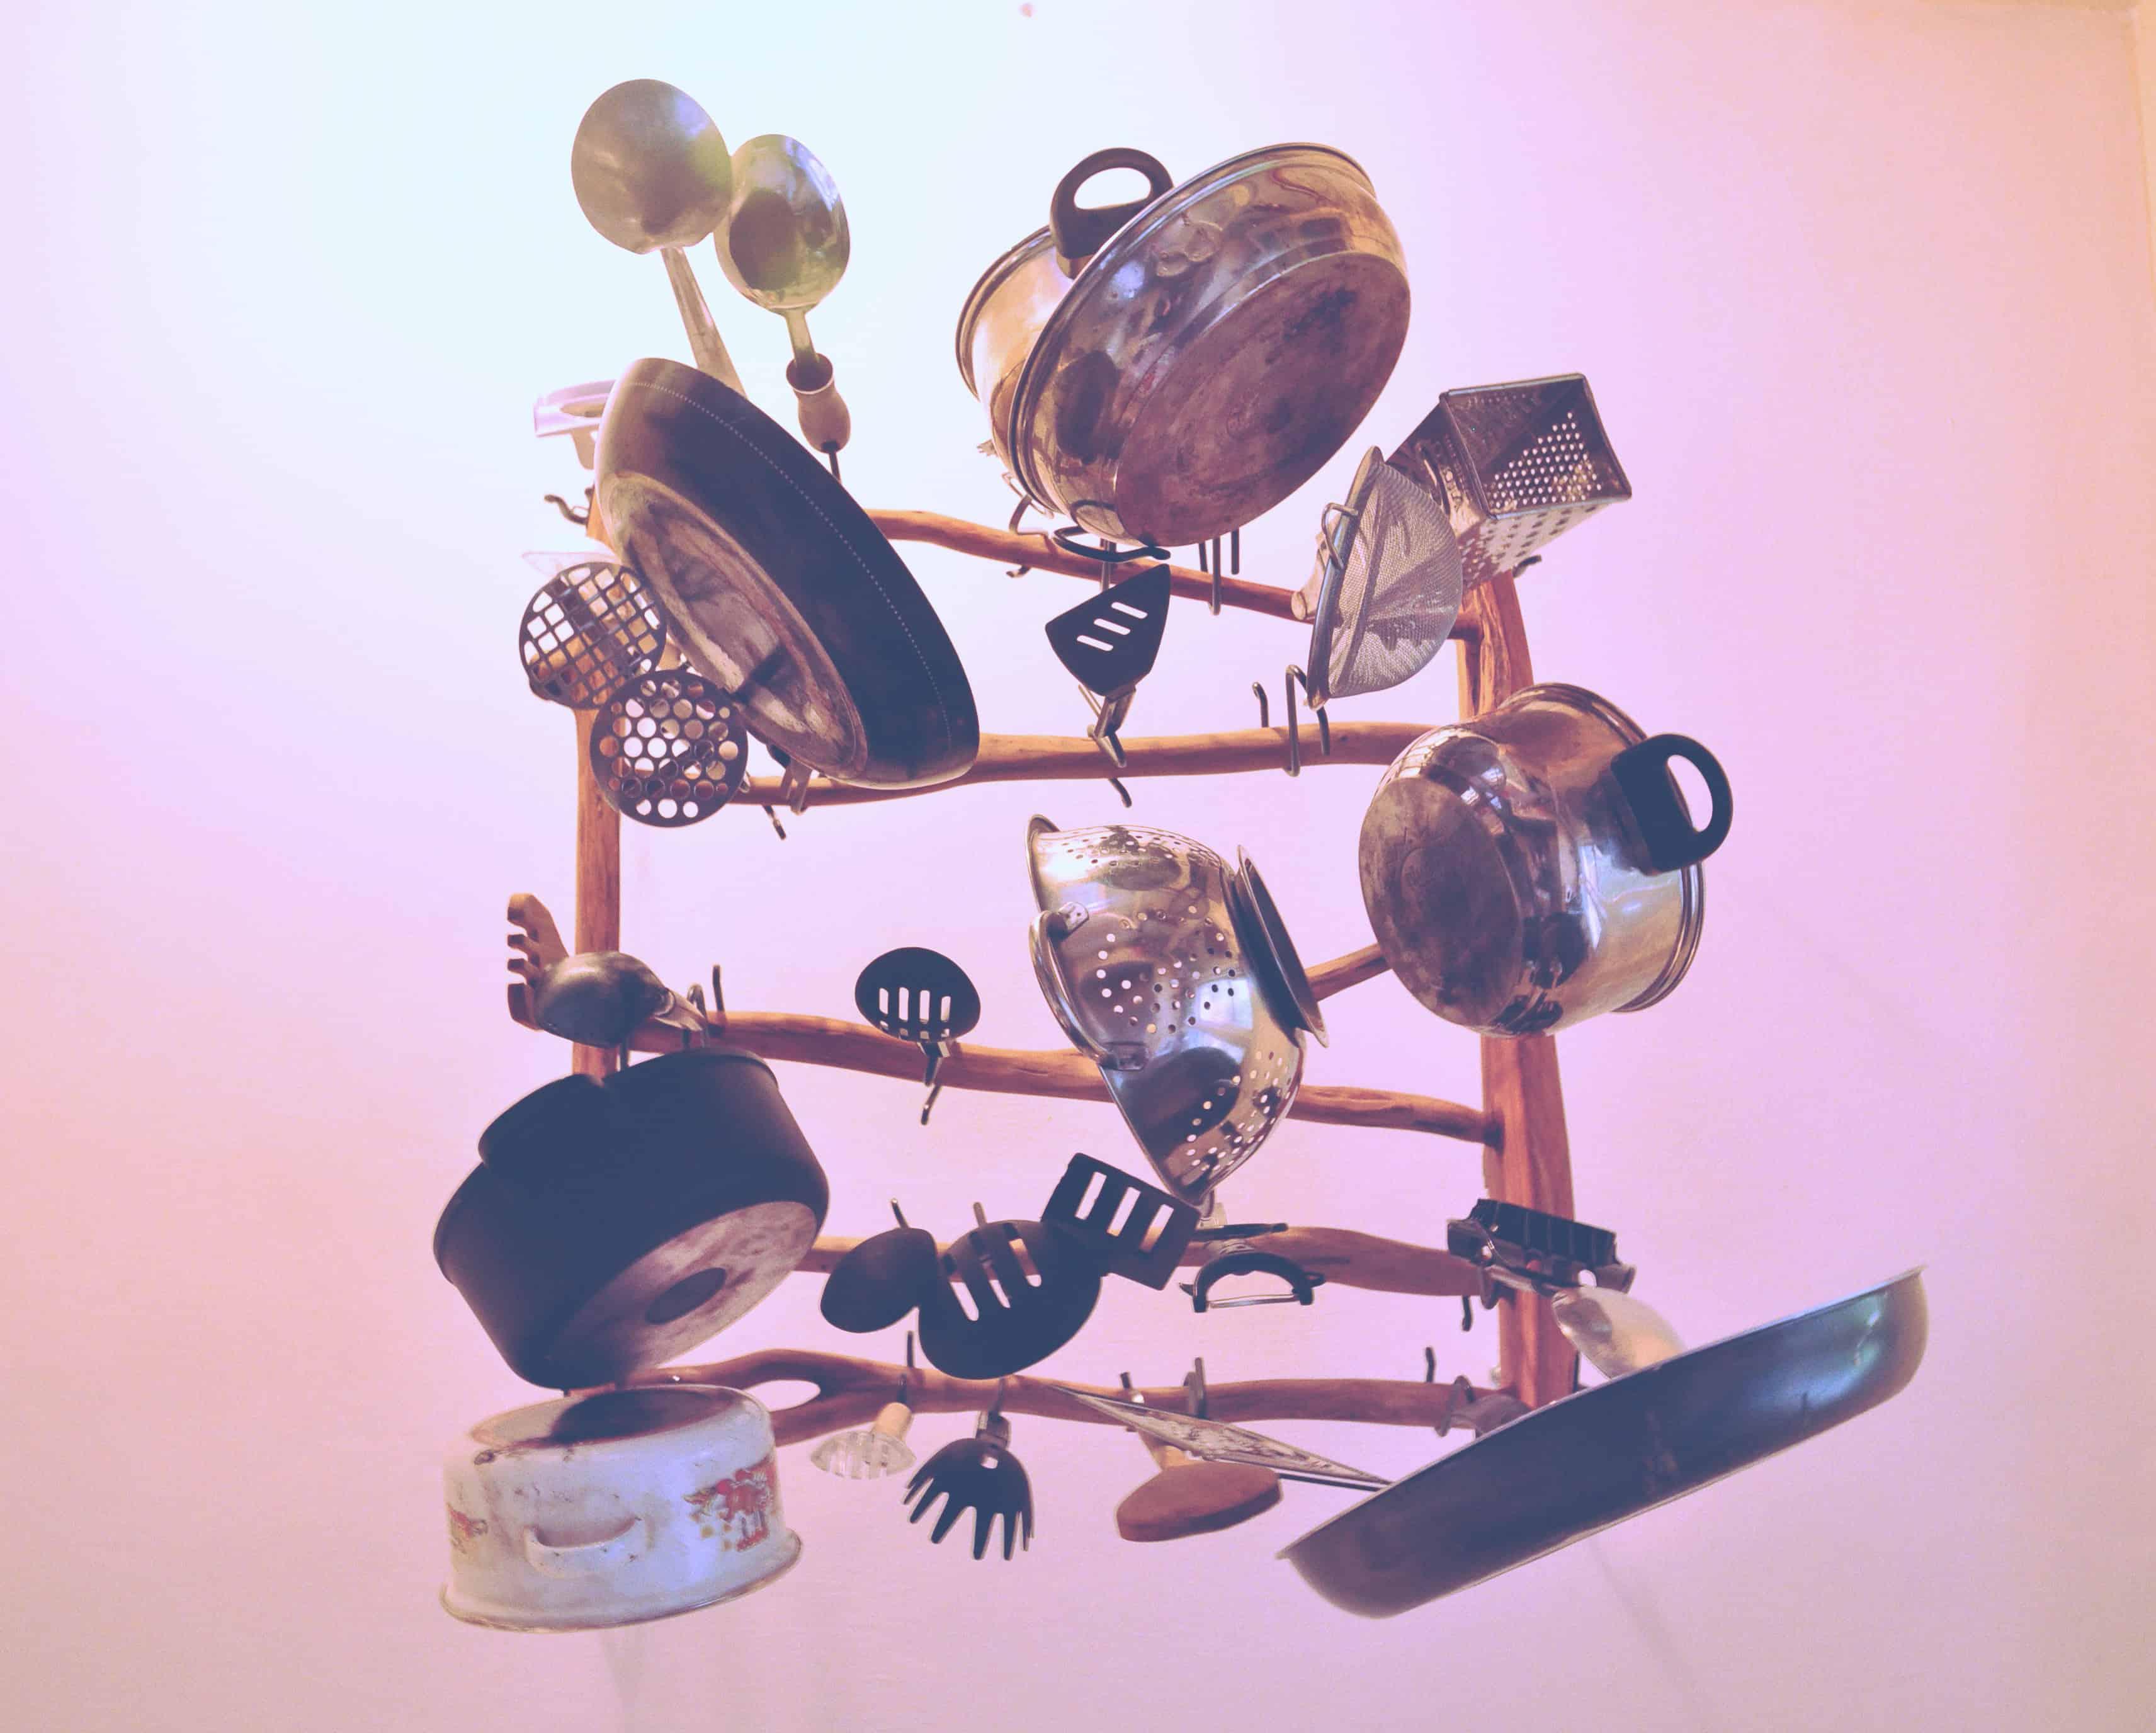 gowb-holiday-kitchen-organizing-utensils